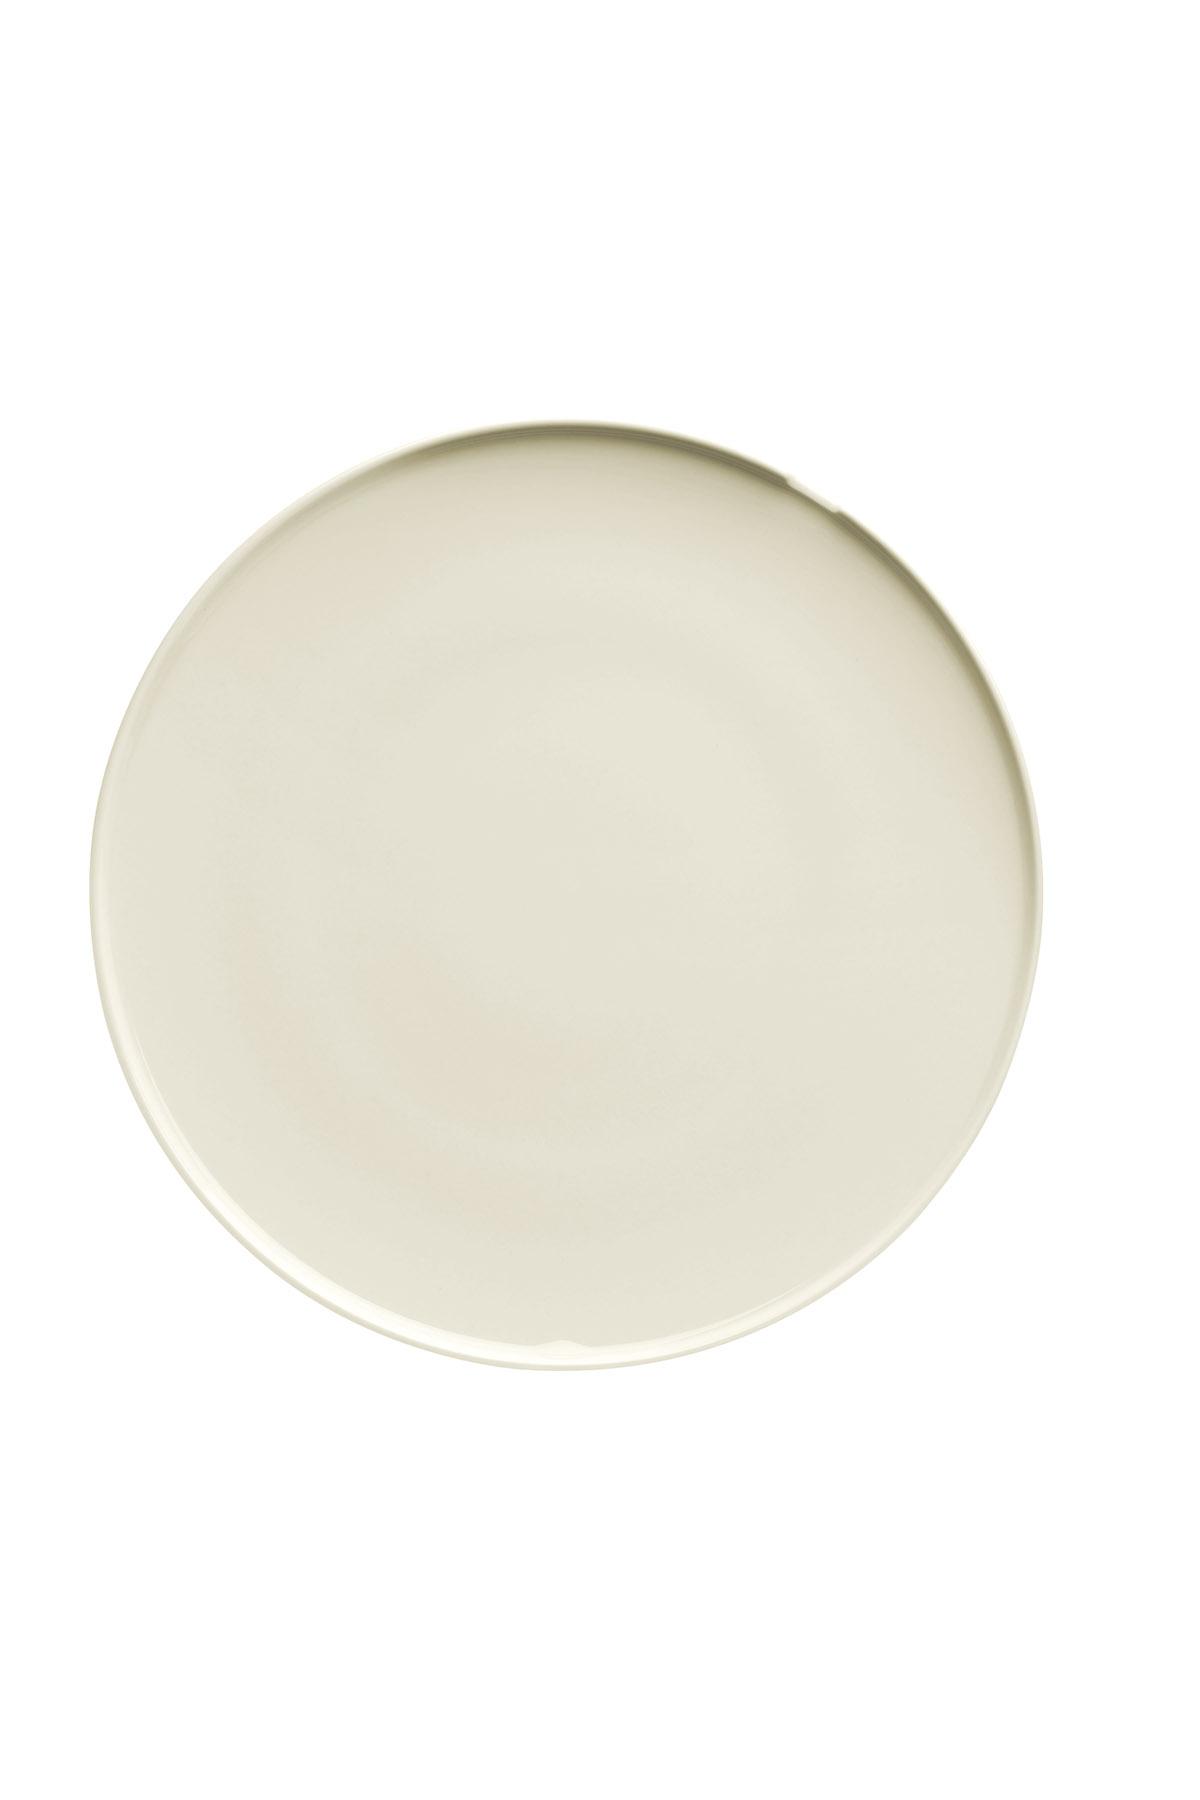 Kütahya Porselen Chef Taste Of 16 cm Düz Tabak Krem